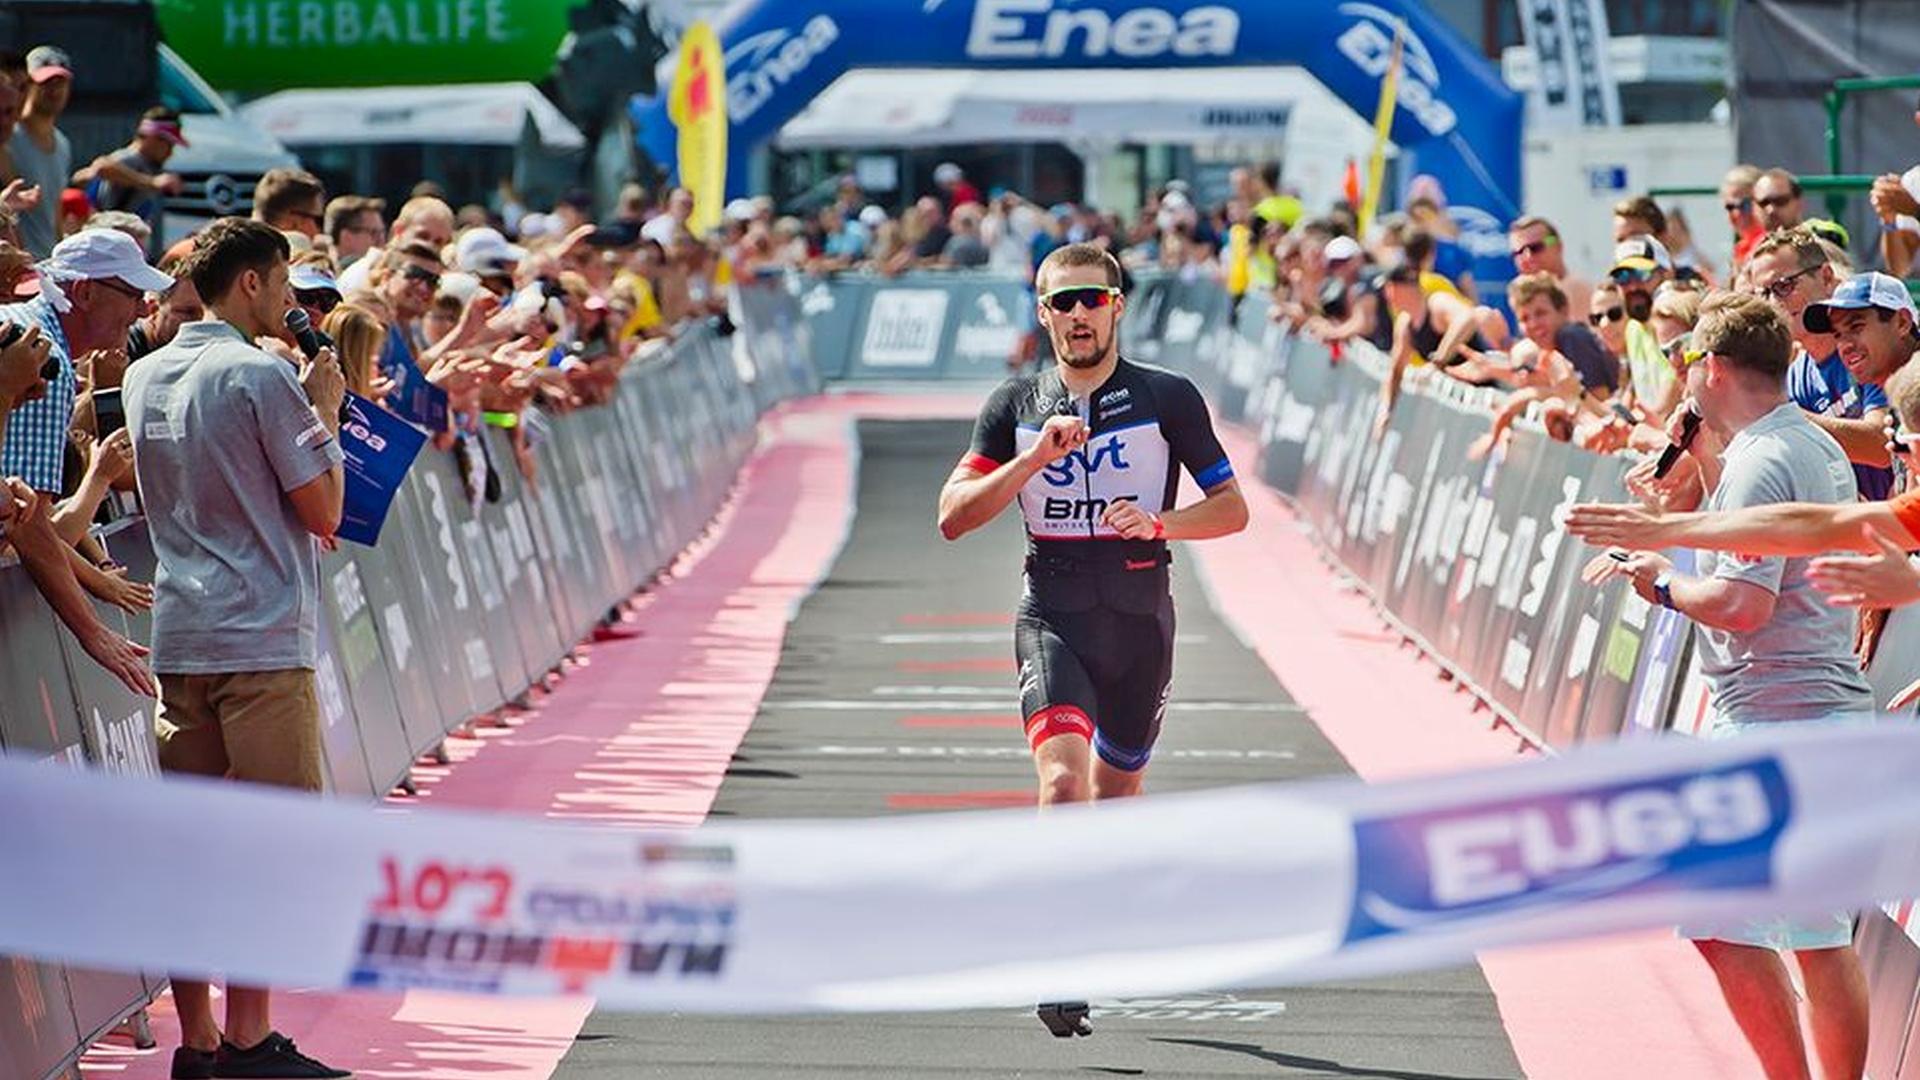 Enea Ironman Gdynia_Fot. Sportografia.pl_Sportevolution.pl (2).jpg